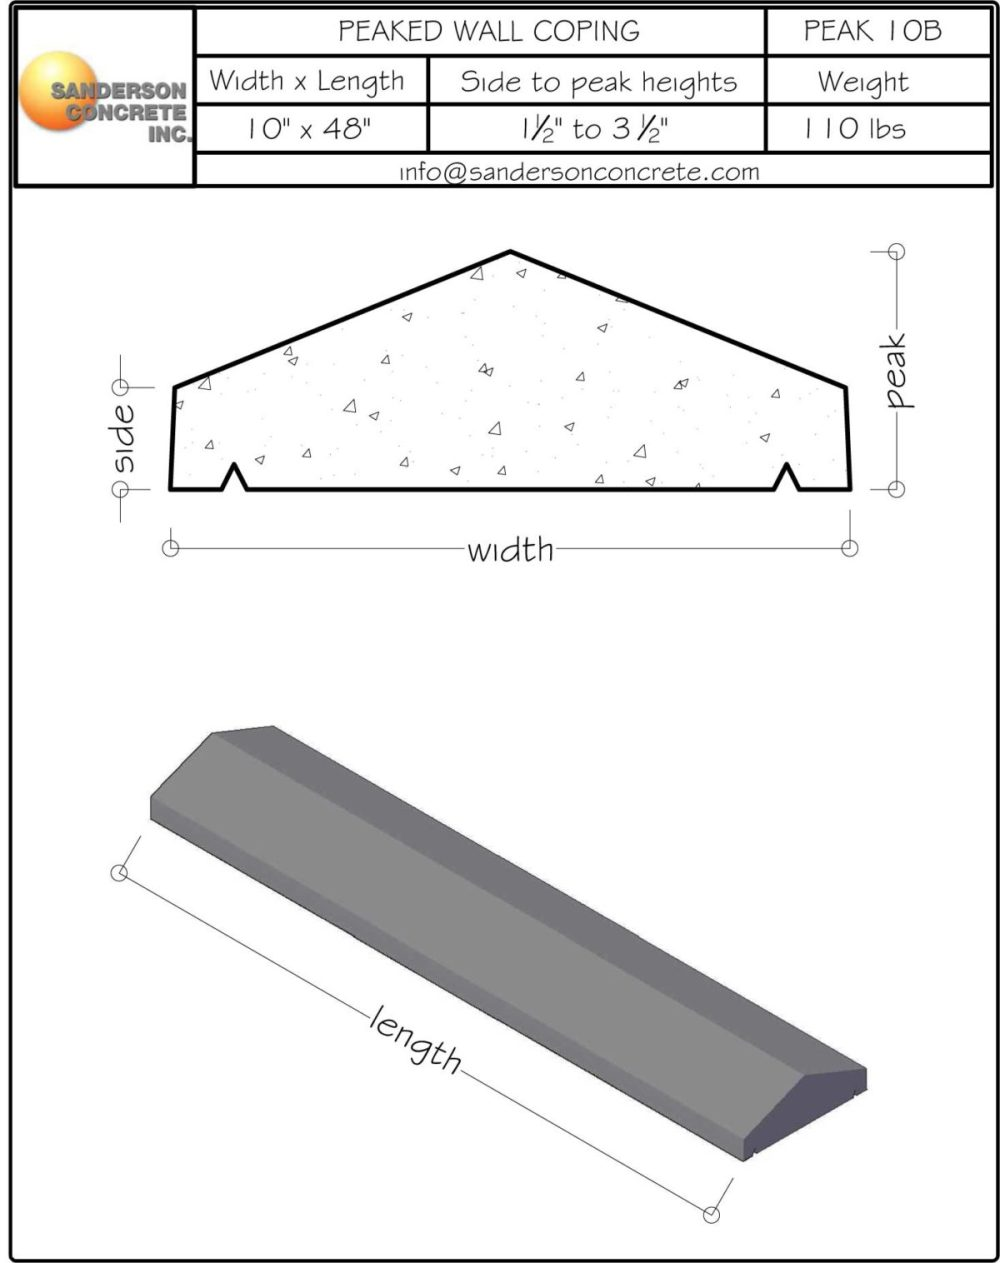 medium resolution of peak10b wall coping